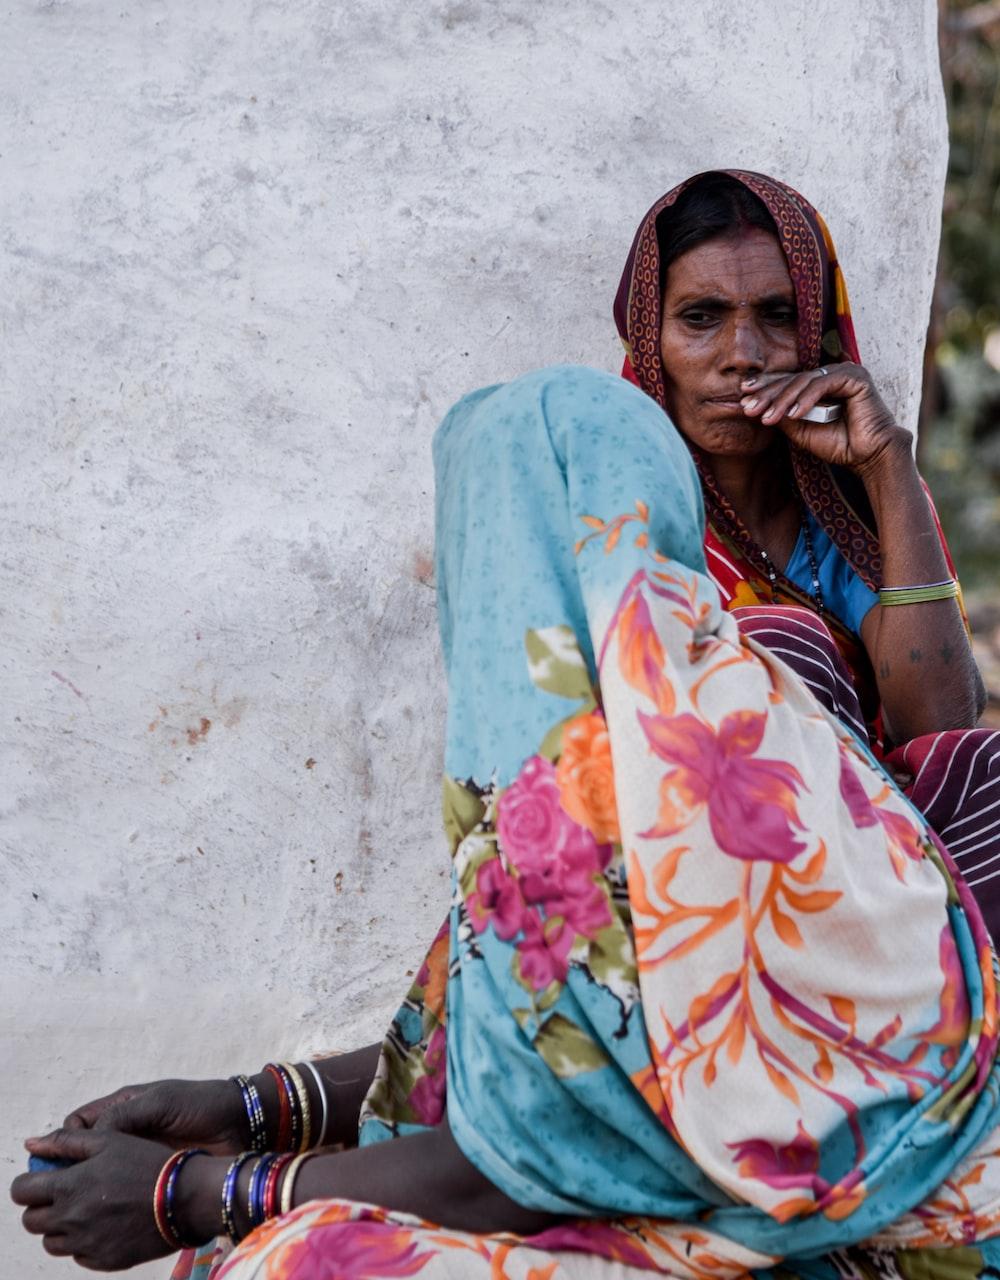 Unemployed women in rural area